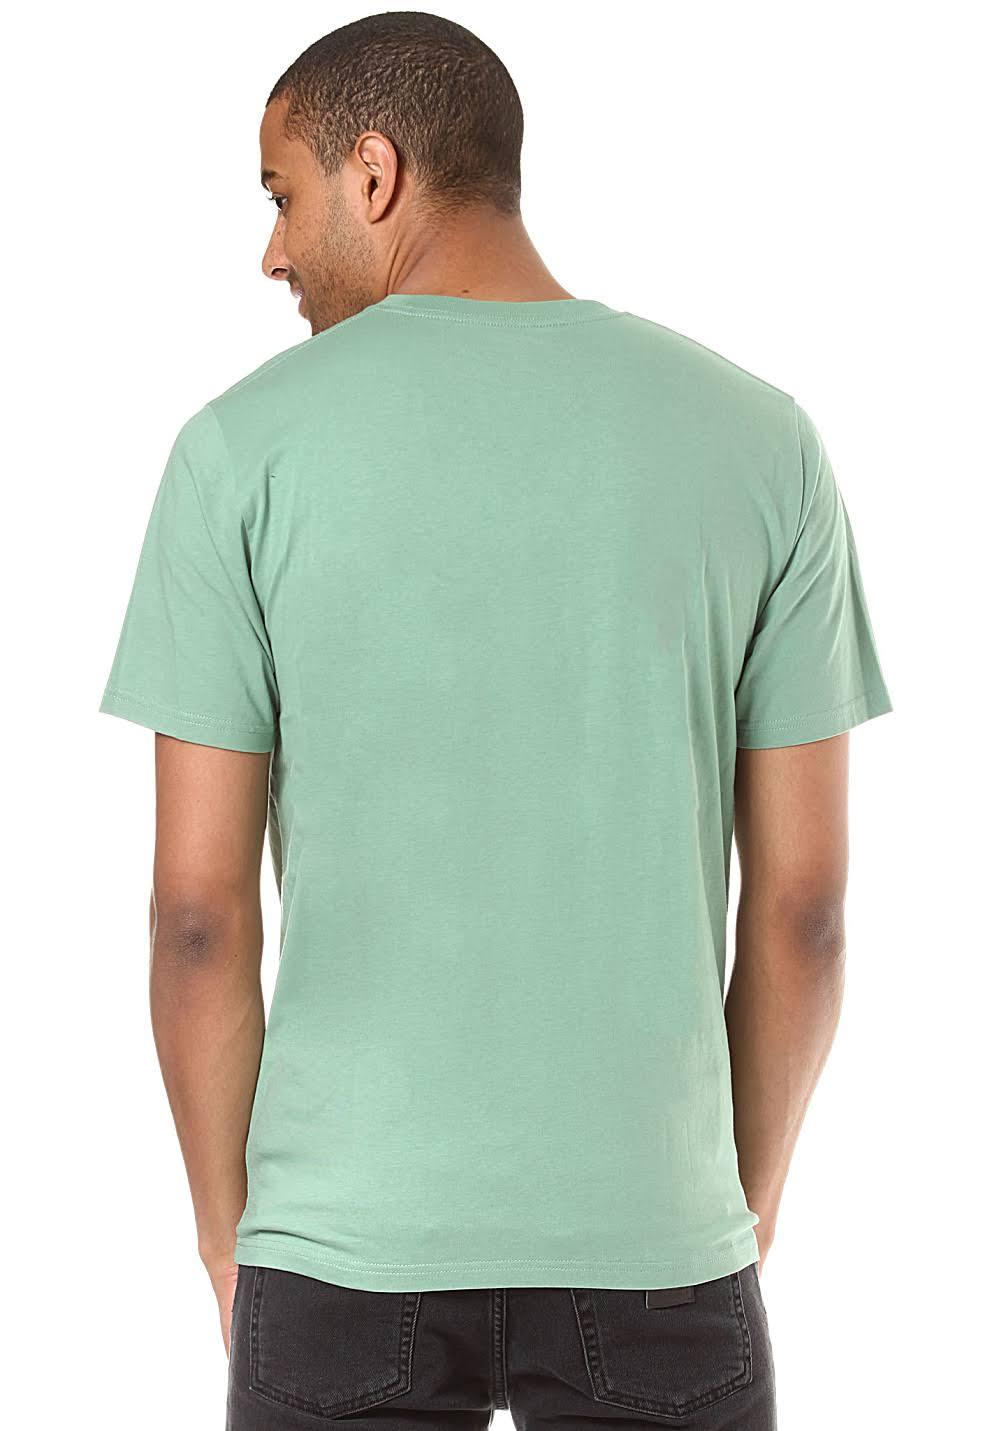 Wip shirt verde uomo T Carhartt sQtrdhCx